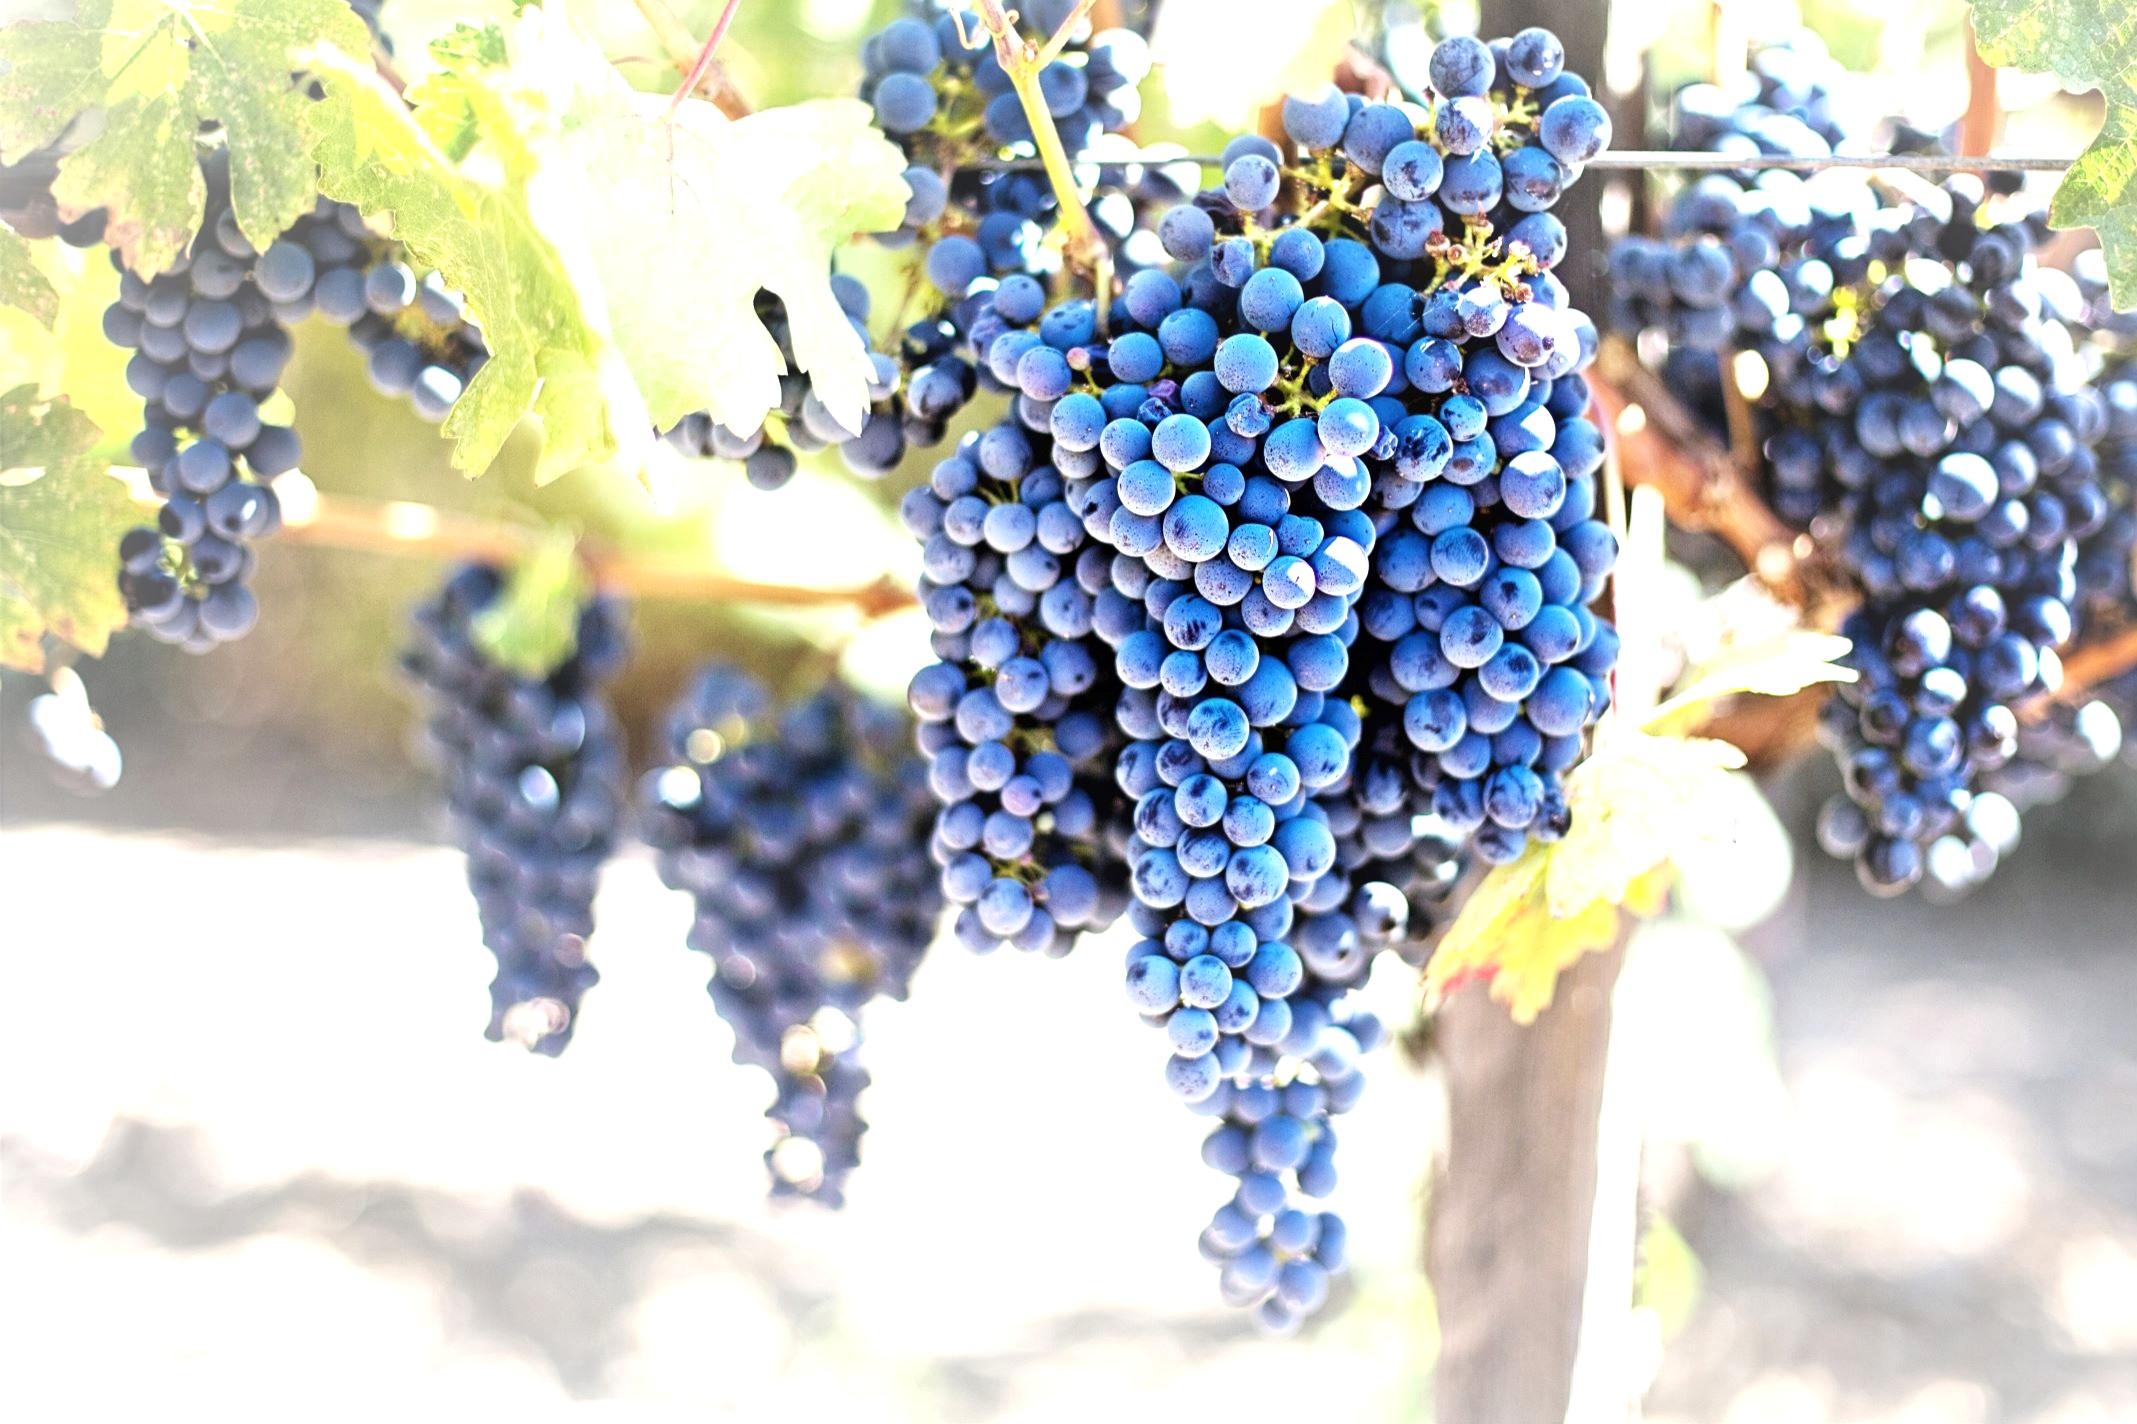 fruits-grapes-grapevines-45209.jpg